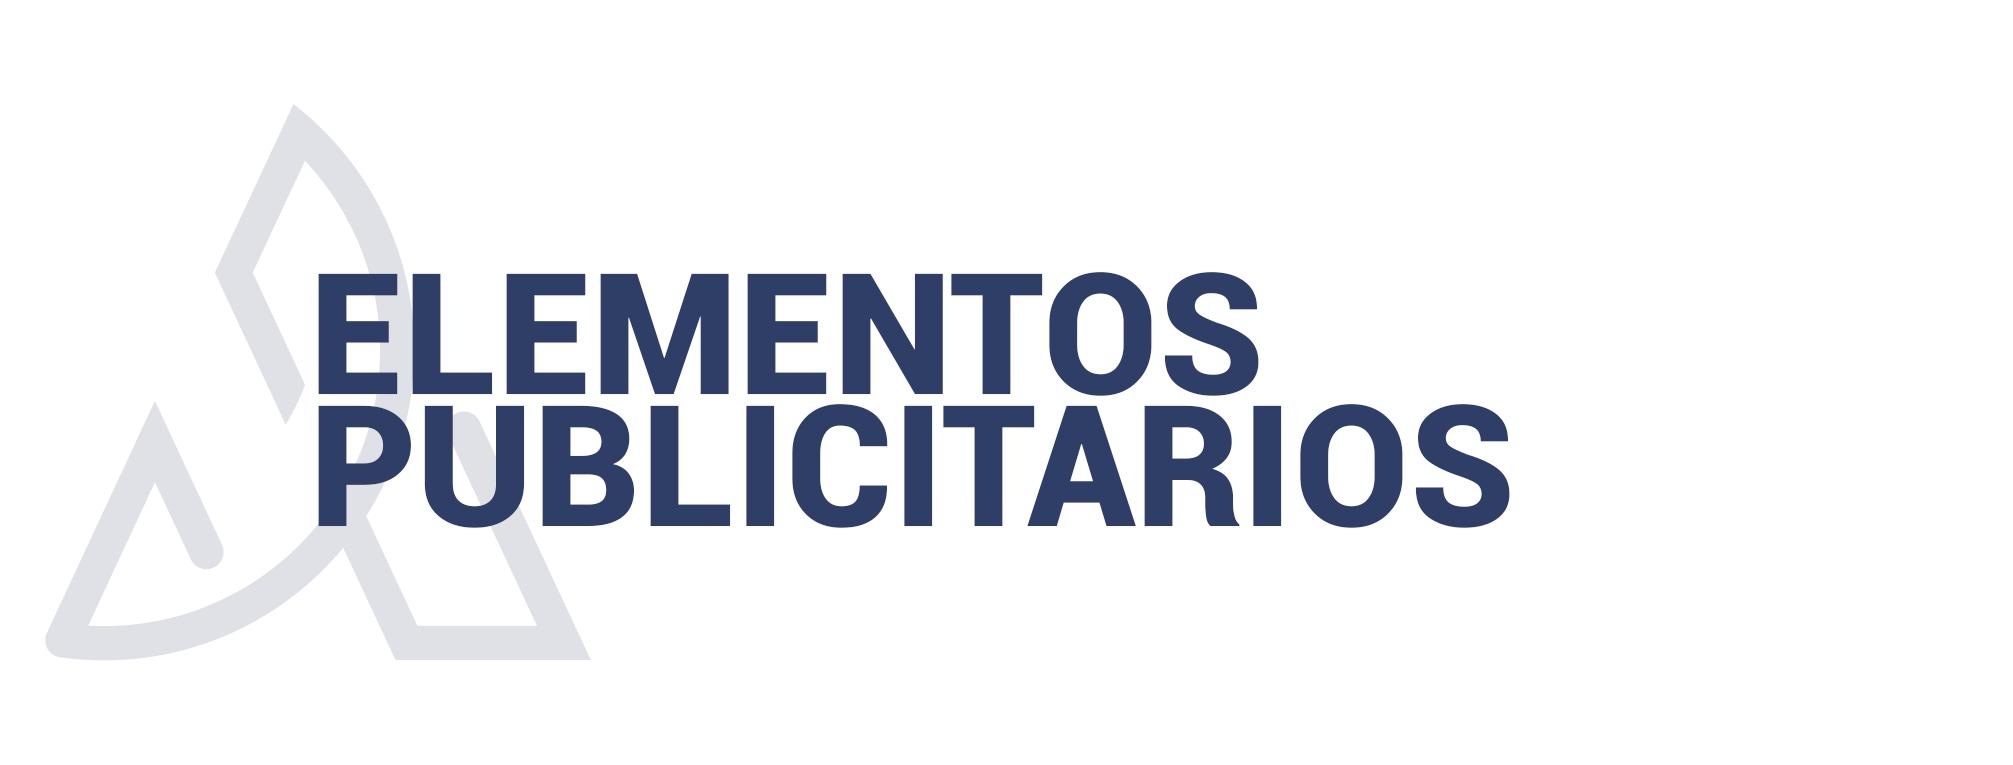 ELEMENTOS PUBLICITARIOS